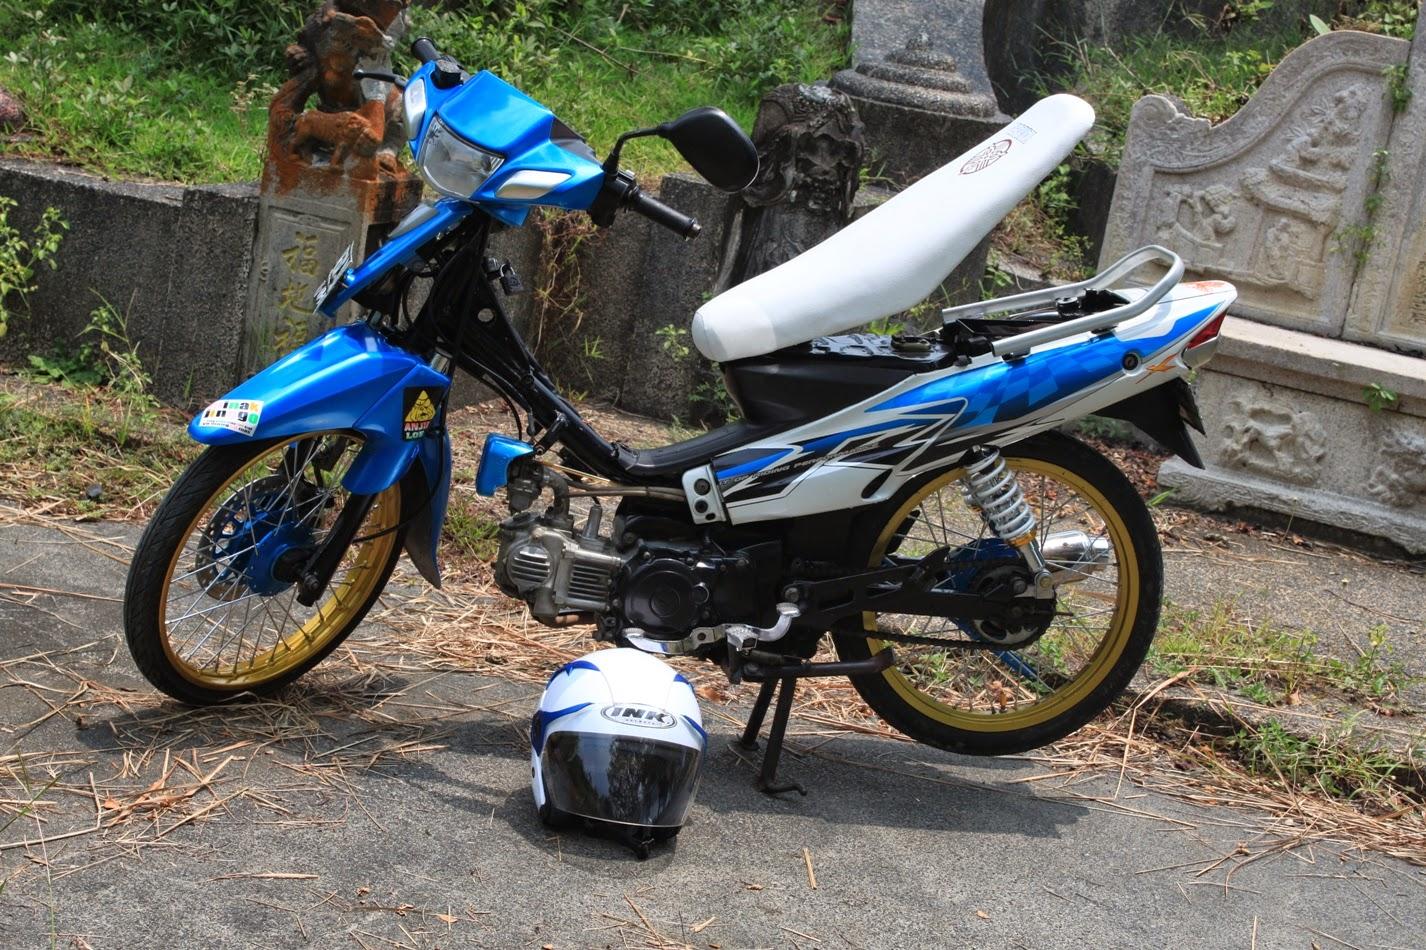 99 Gambar Motor Fino Modifikasi Terupdate